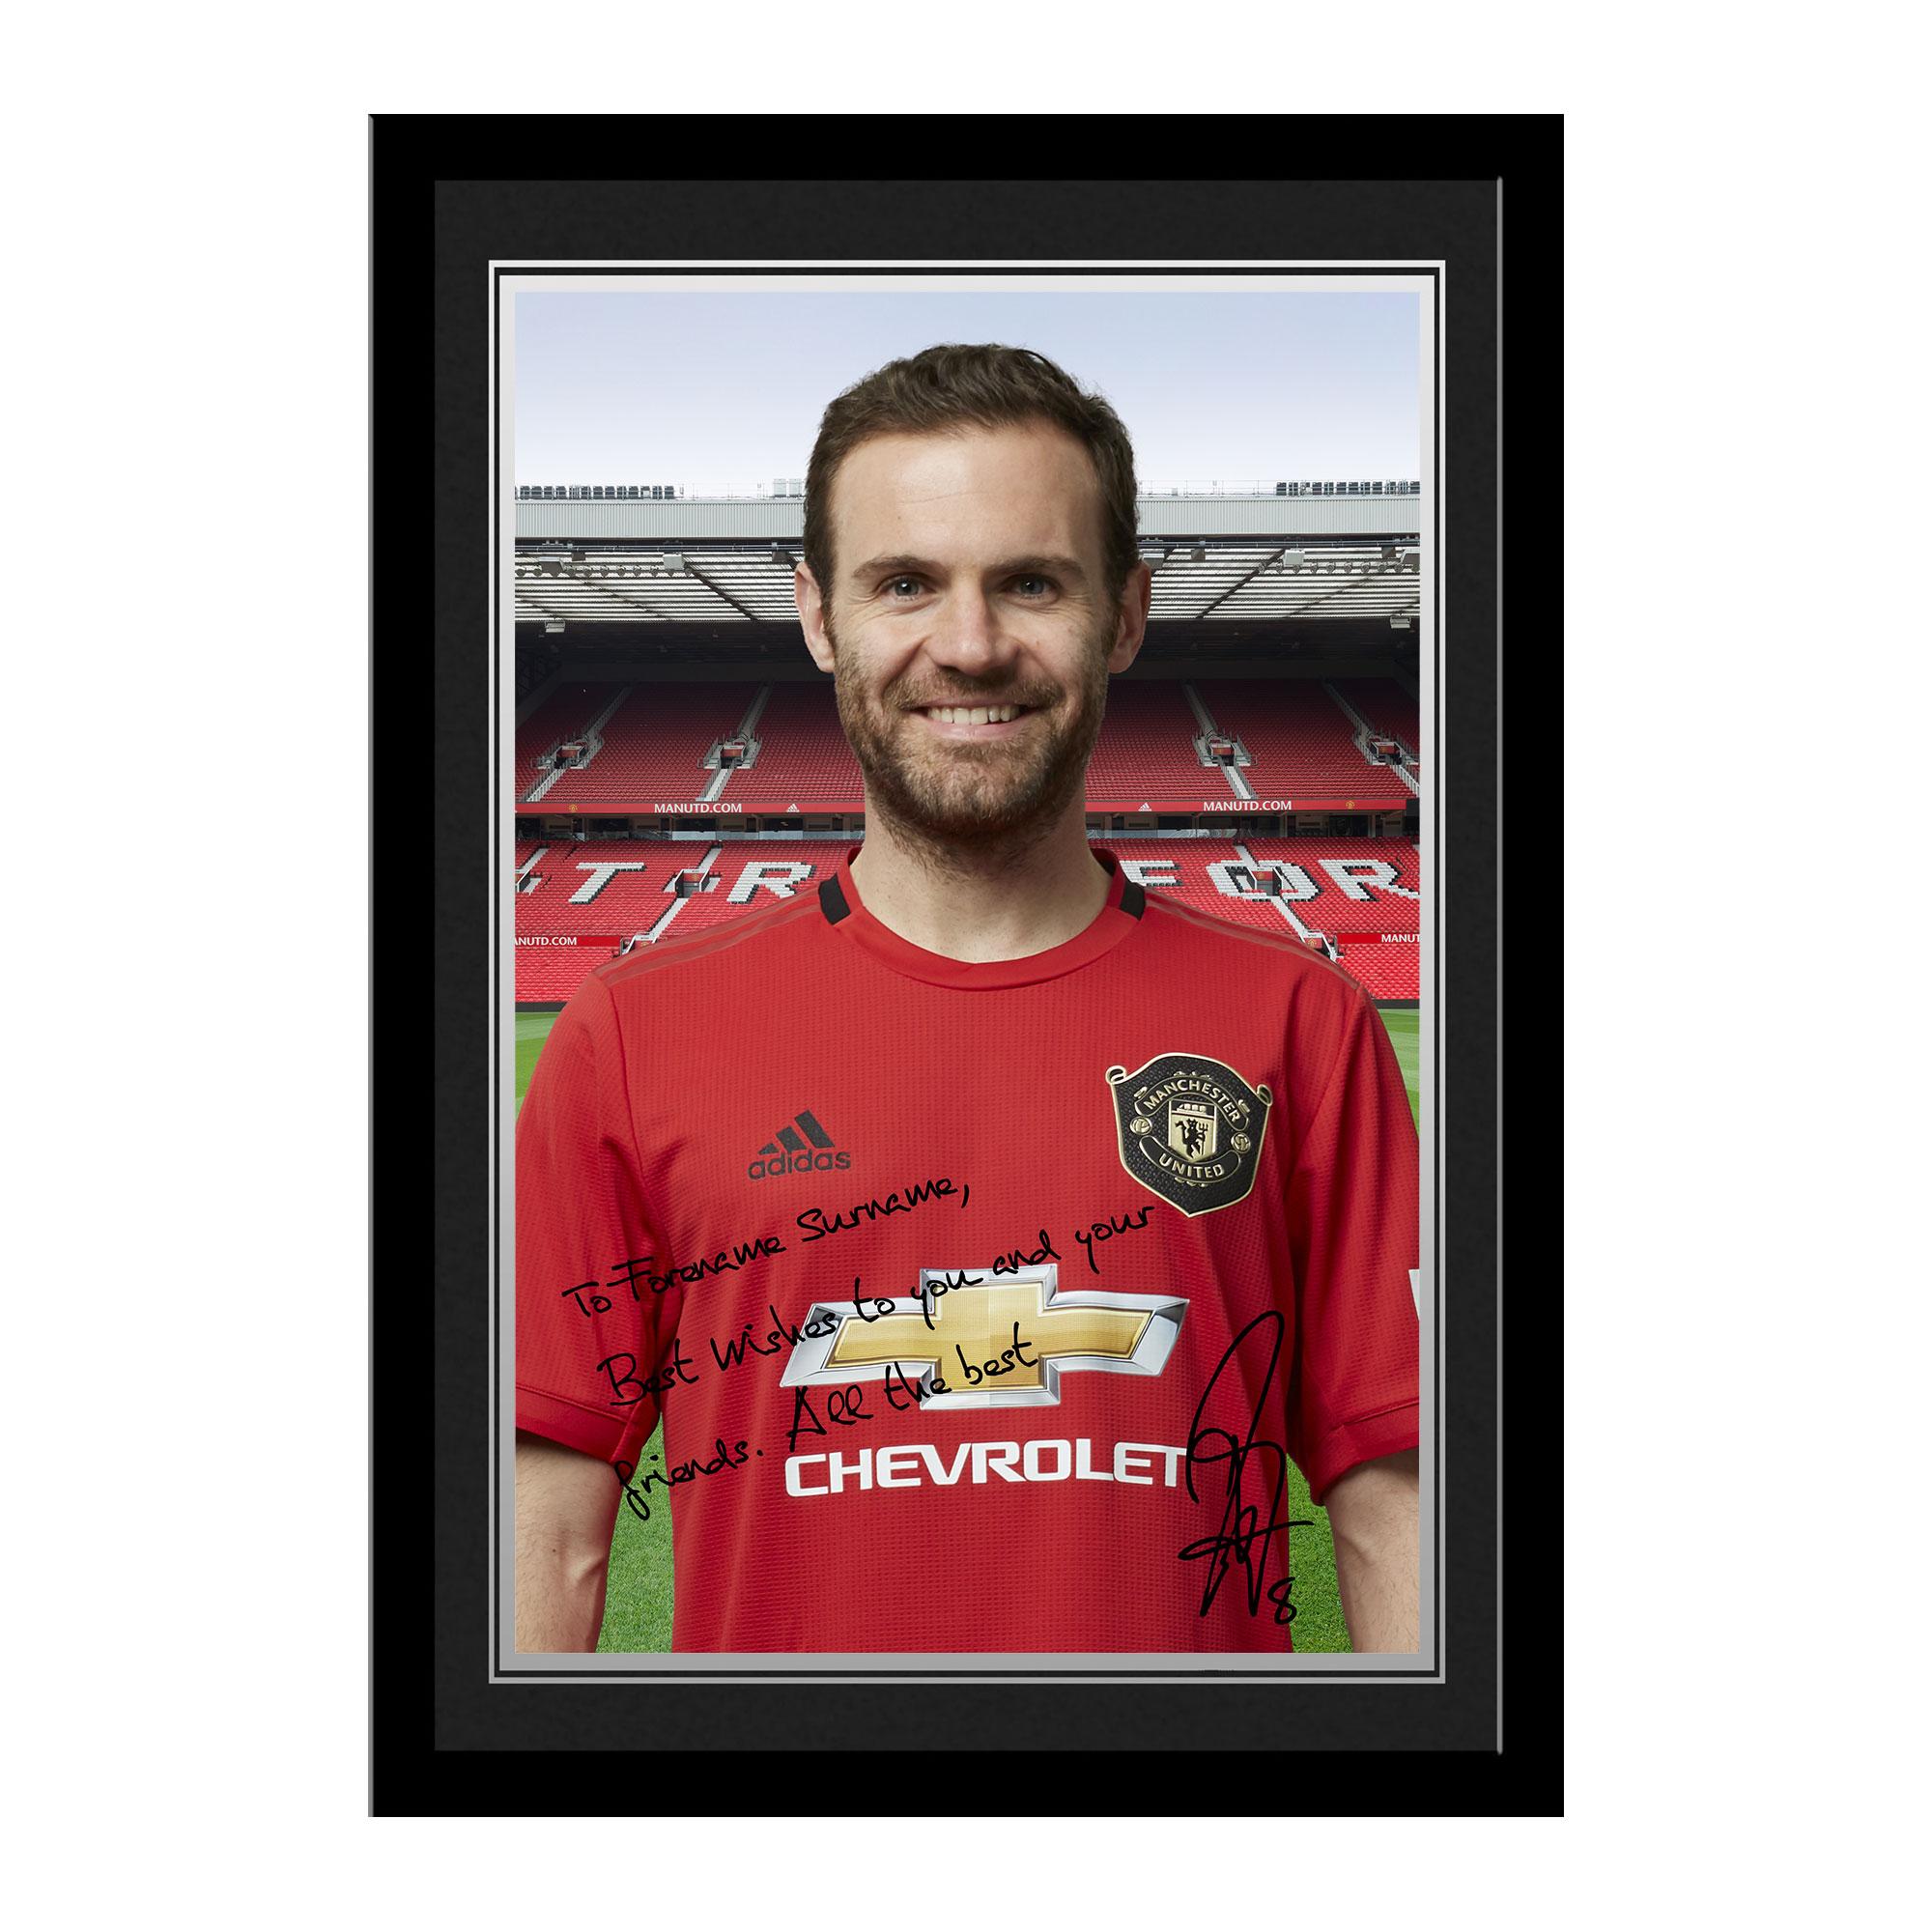 Manchester United Personalised Signature Photo Framed - Mata